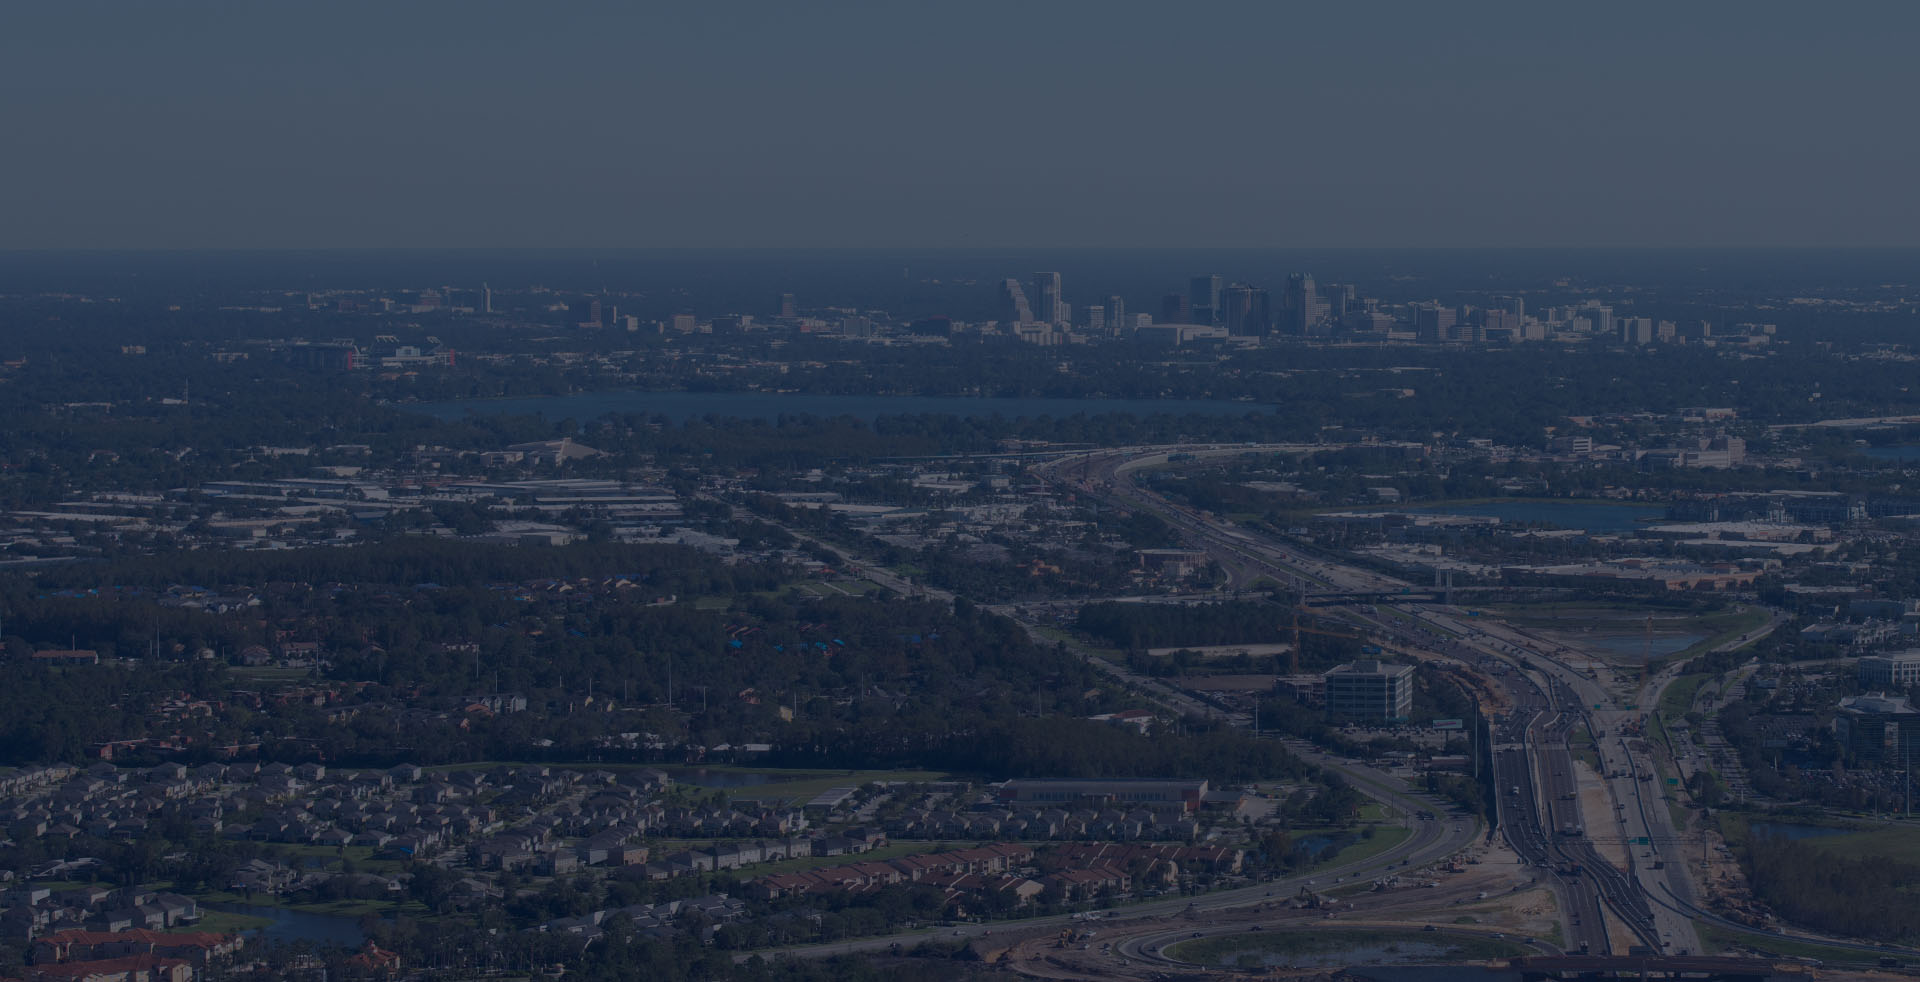 City of Orlando in Central Florida Real Estate